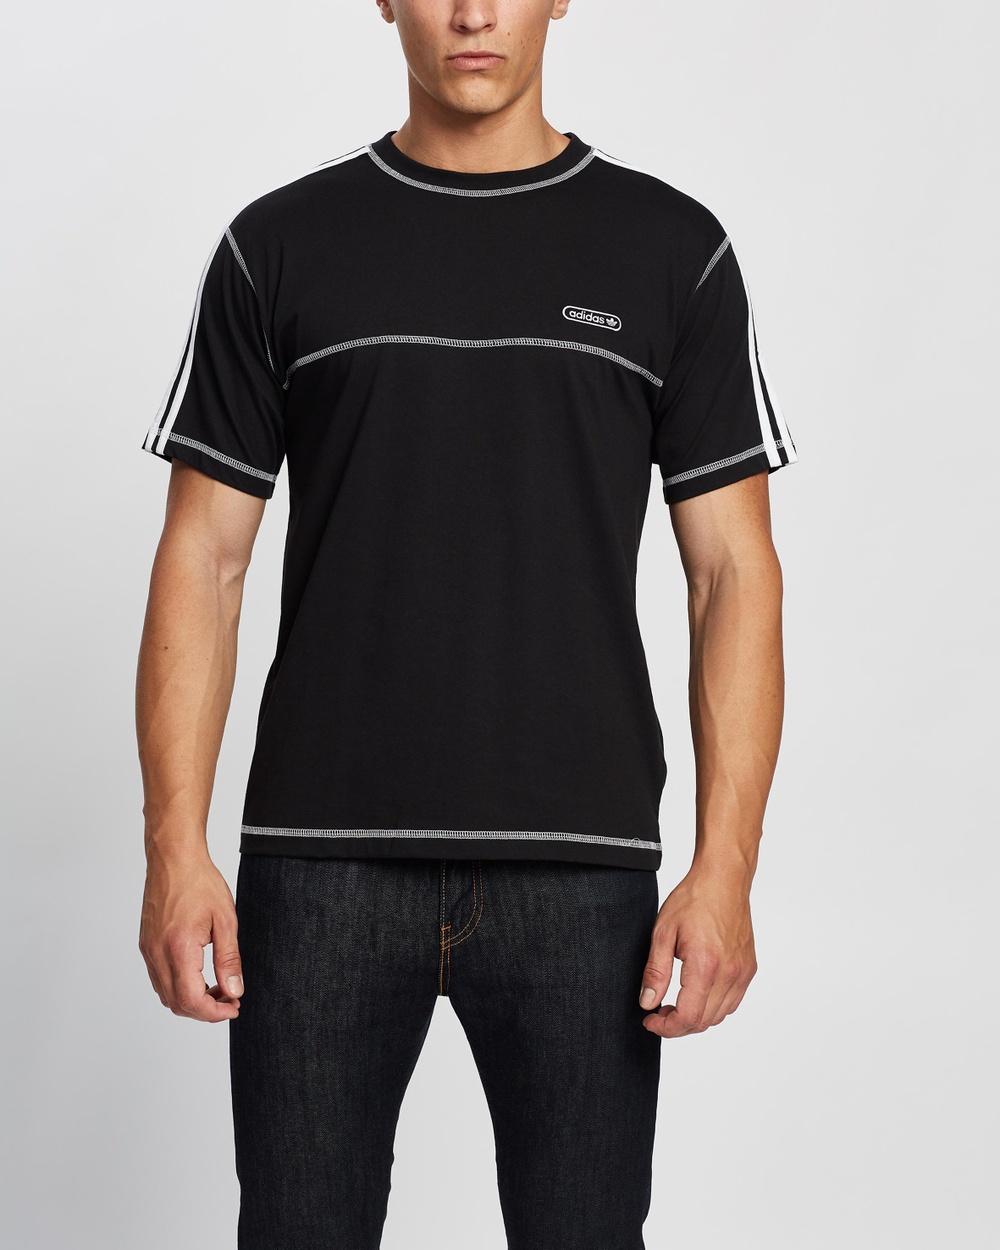 adidas Originals Contrast Stitch Tee T-Shirts & Singlets Black